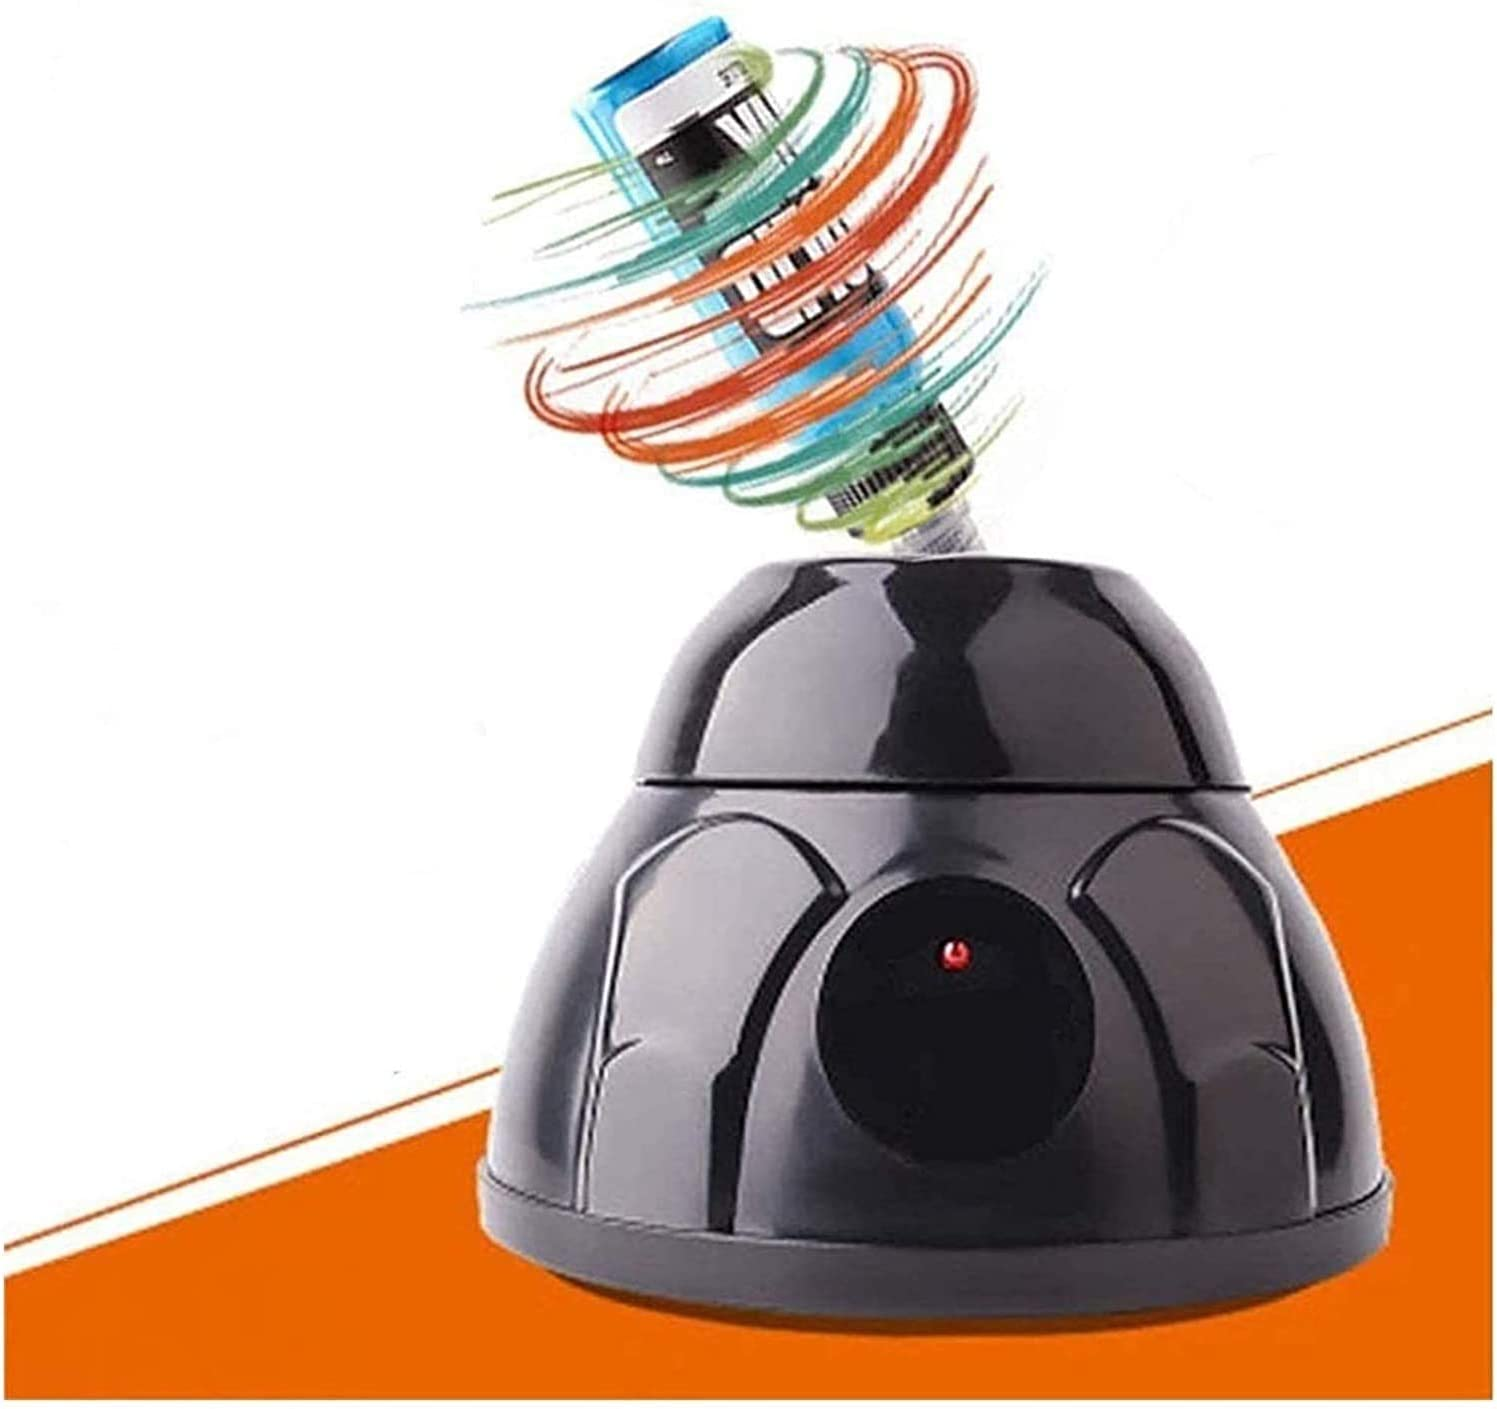 QDY Trust -Mini Denver Mall Vortex Mixer Touch 5200Rpm Lab Shak Function